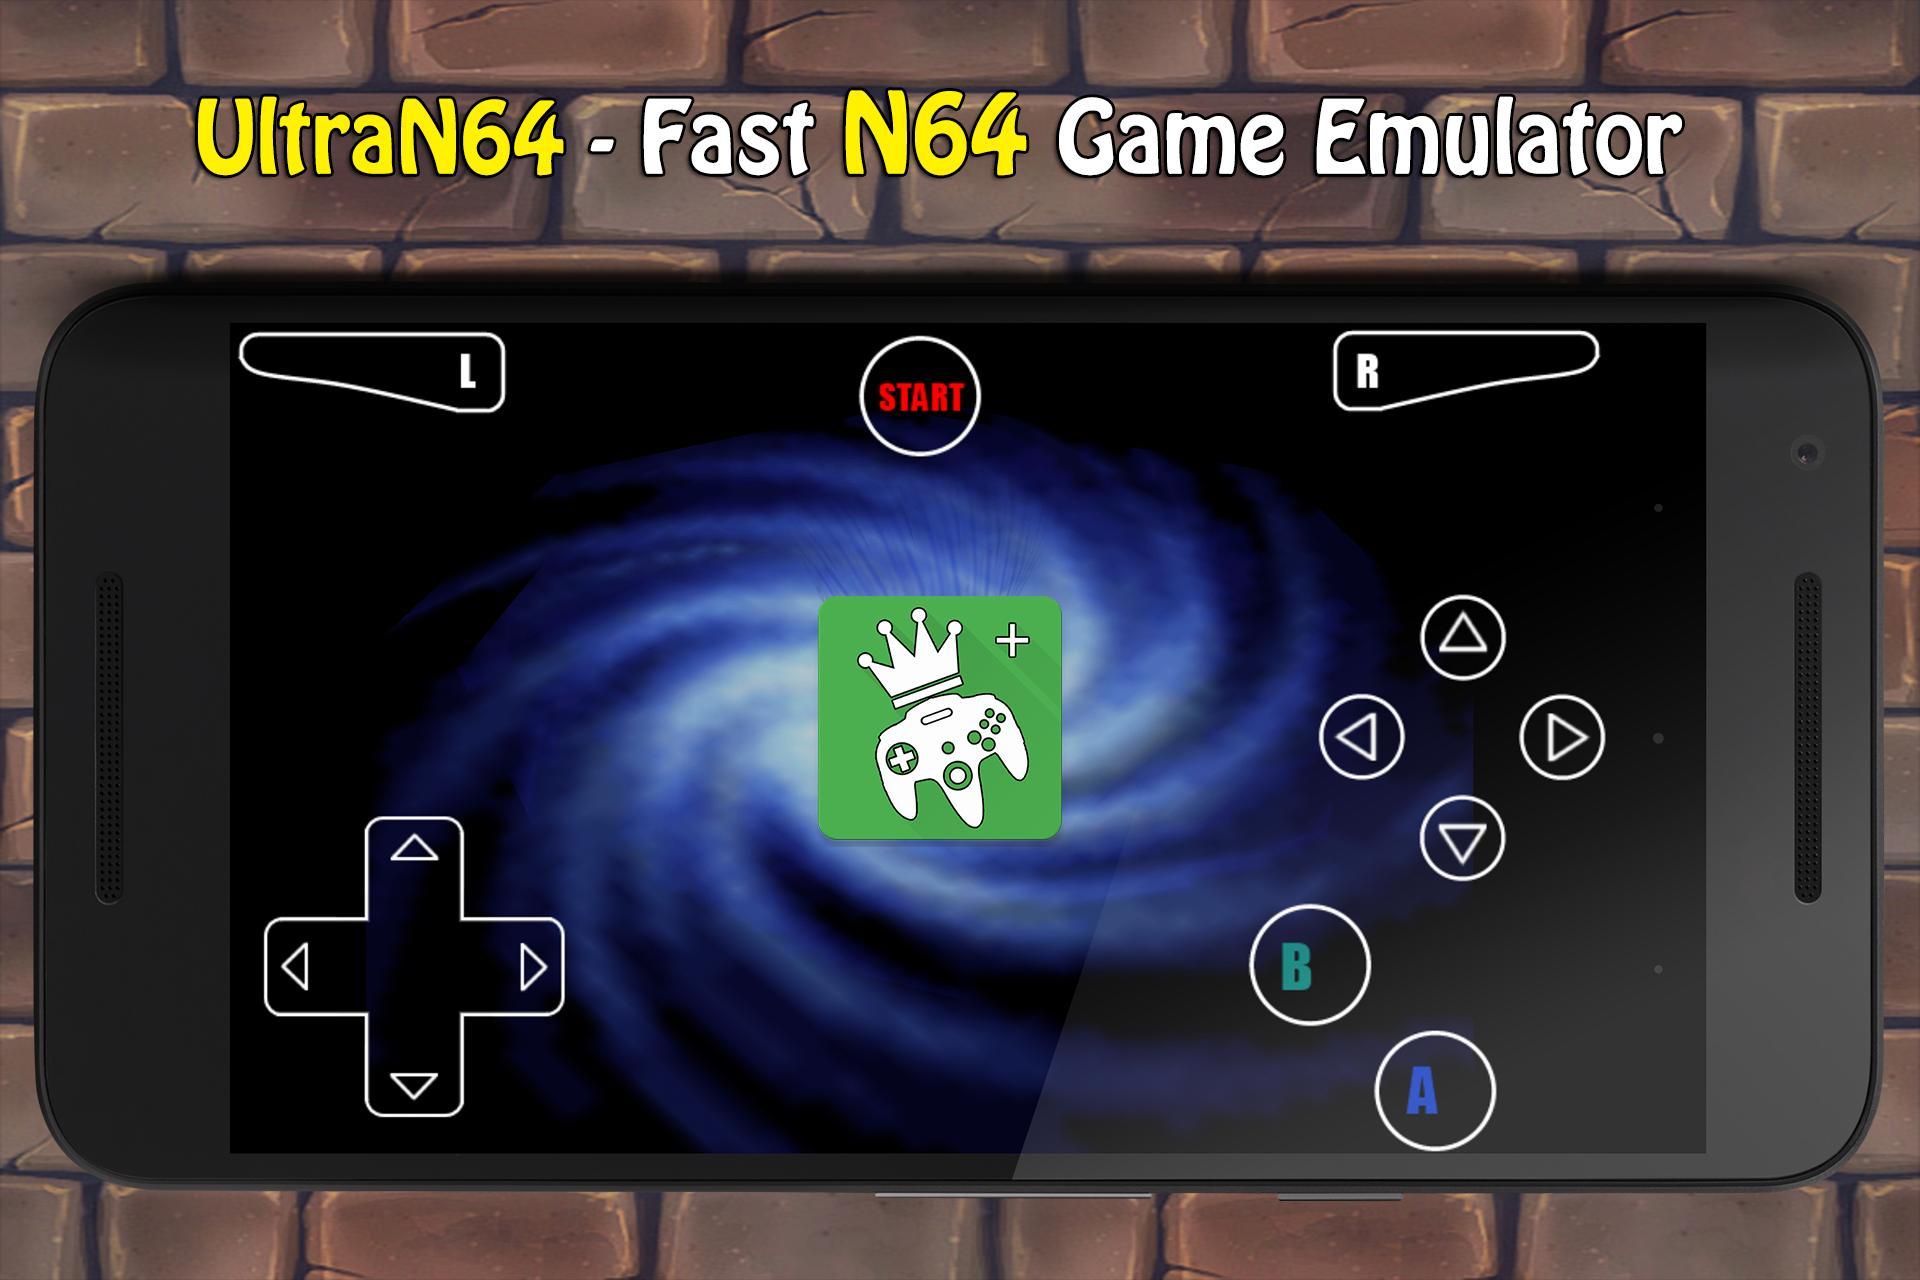 download n64 emulator android apk